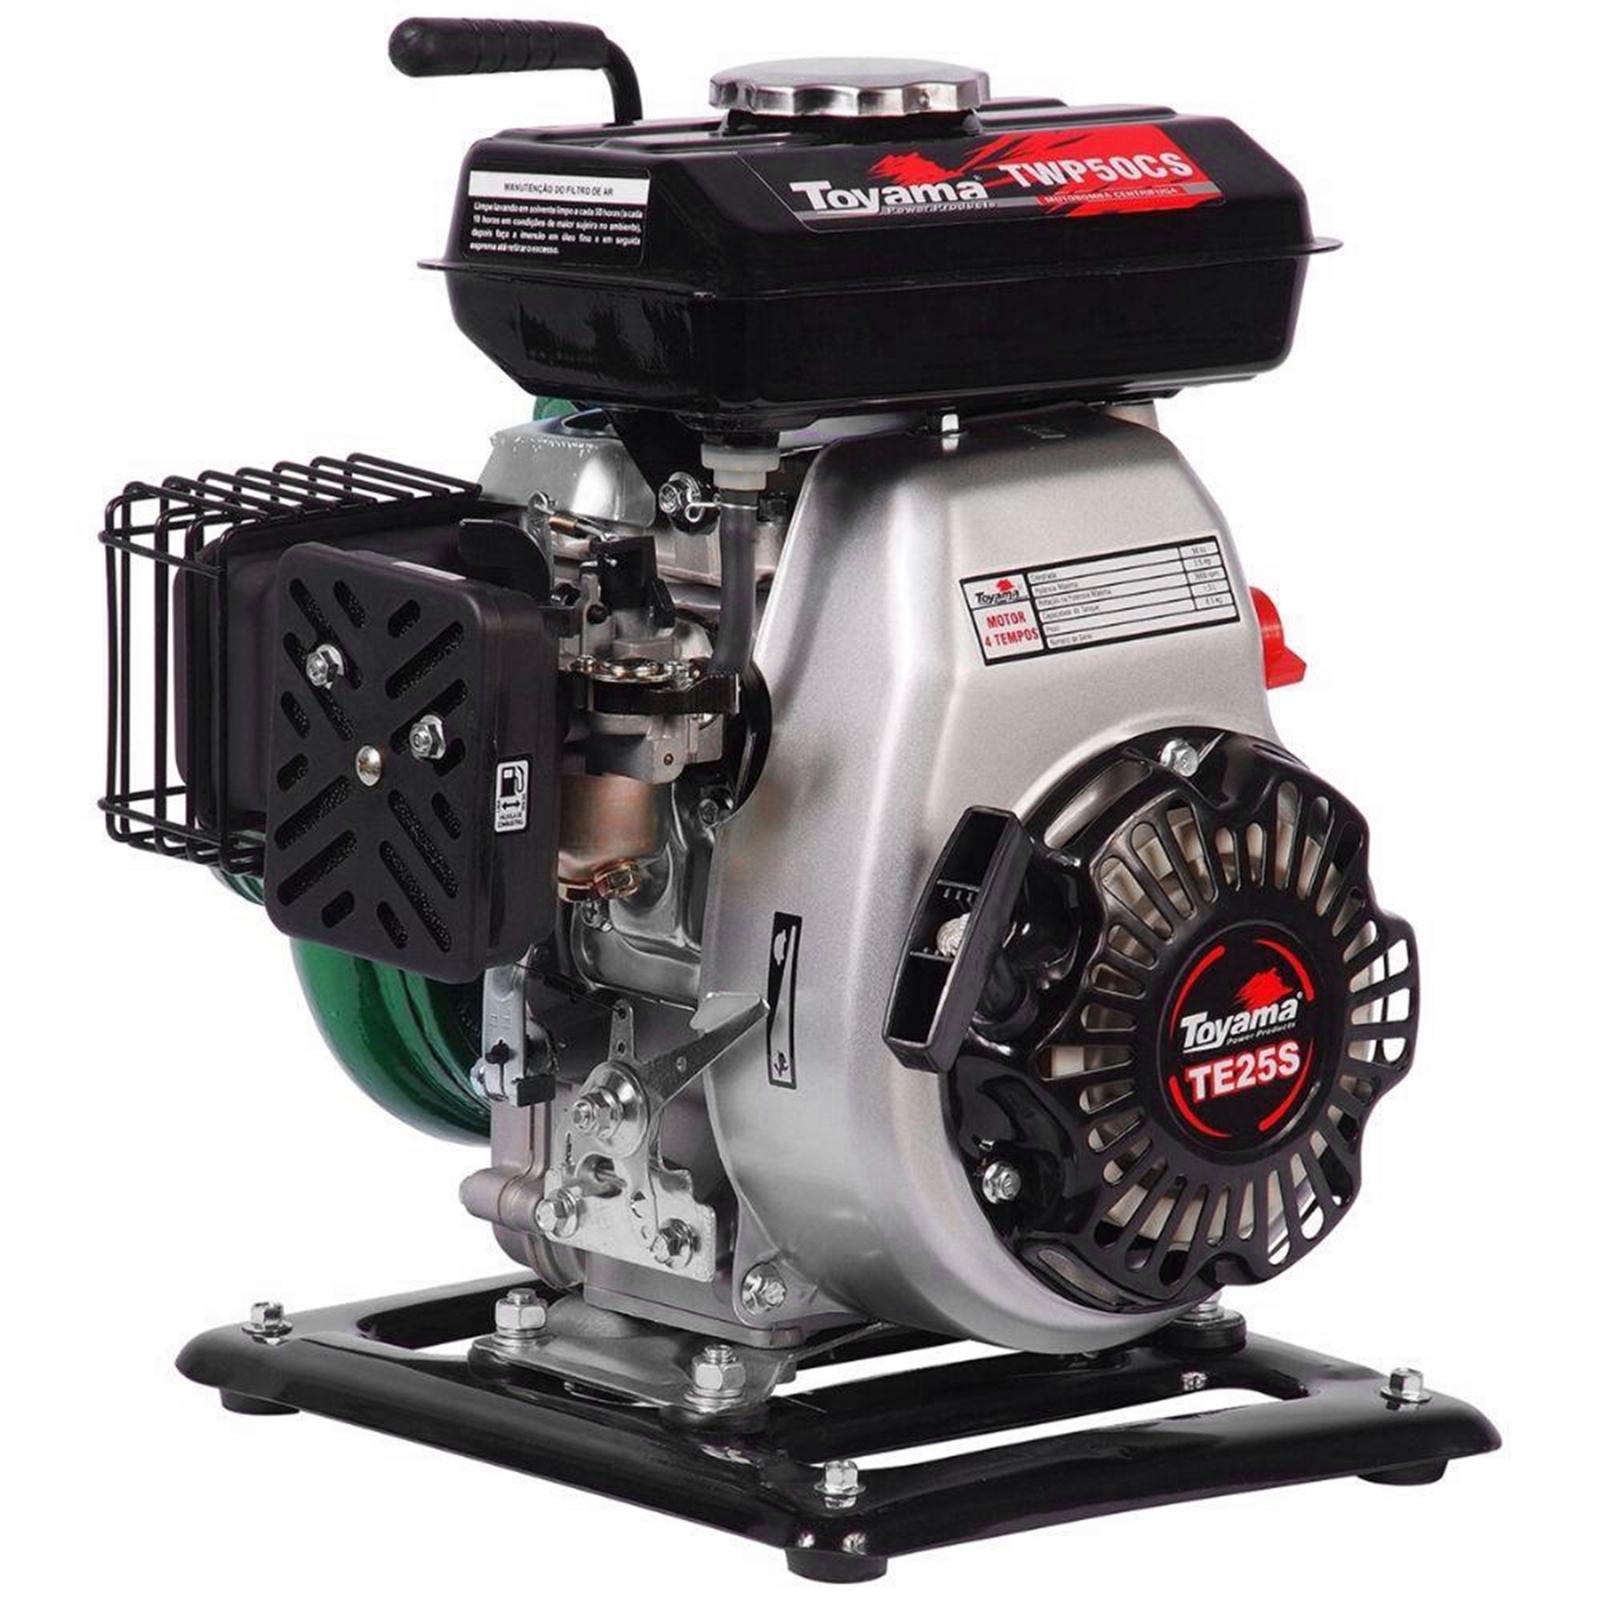 Motobomba Centrifuga a Gasolina Toyama Twp50cs Bc1 - Ferramentas MEP